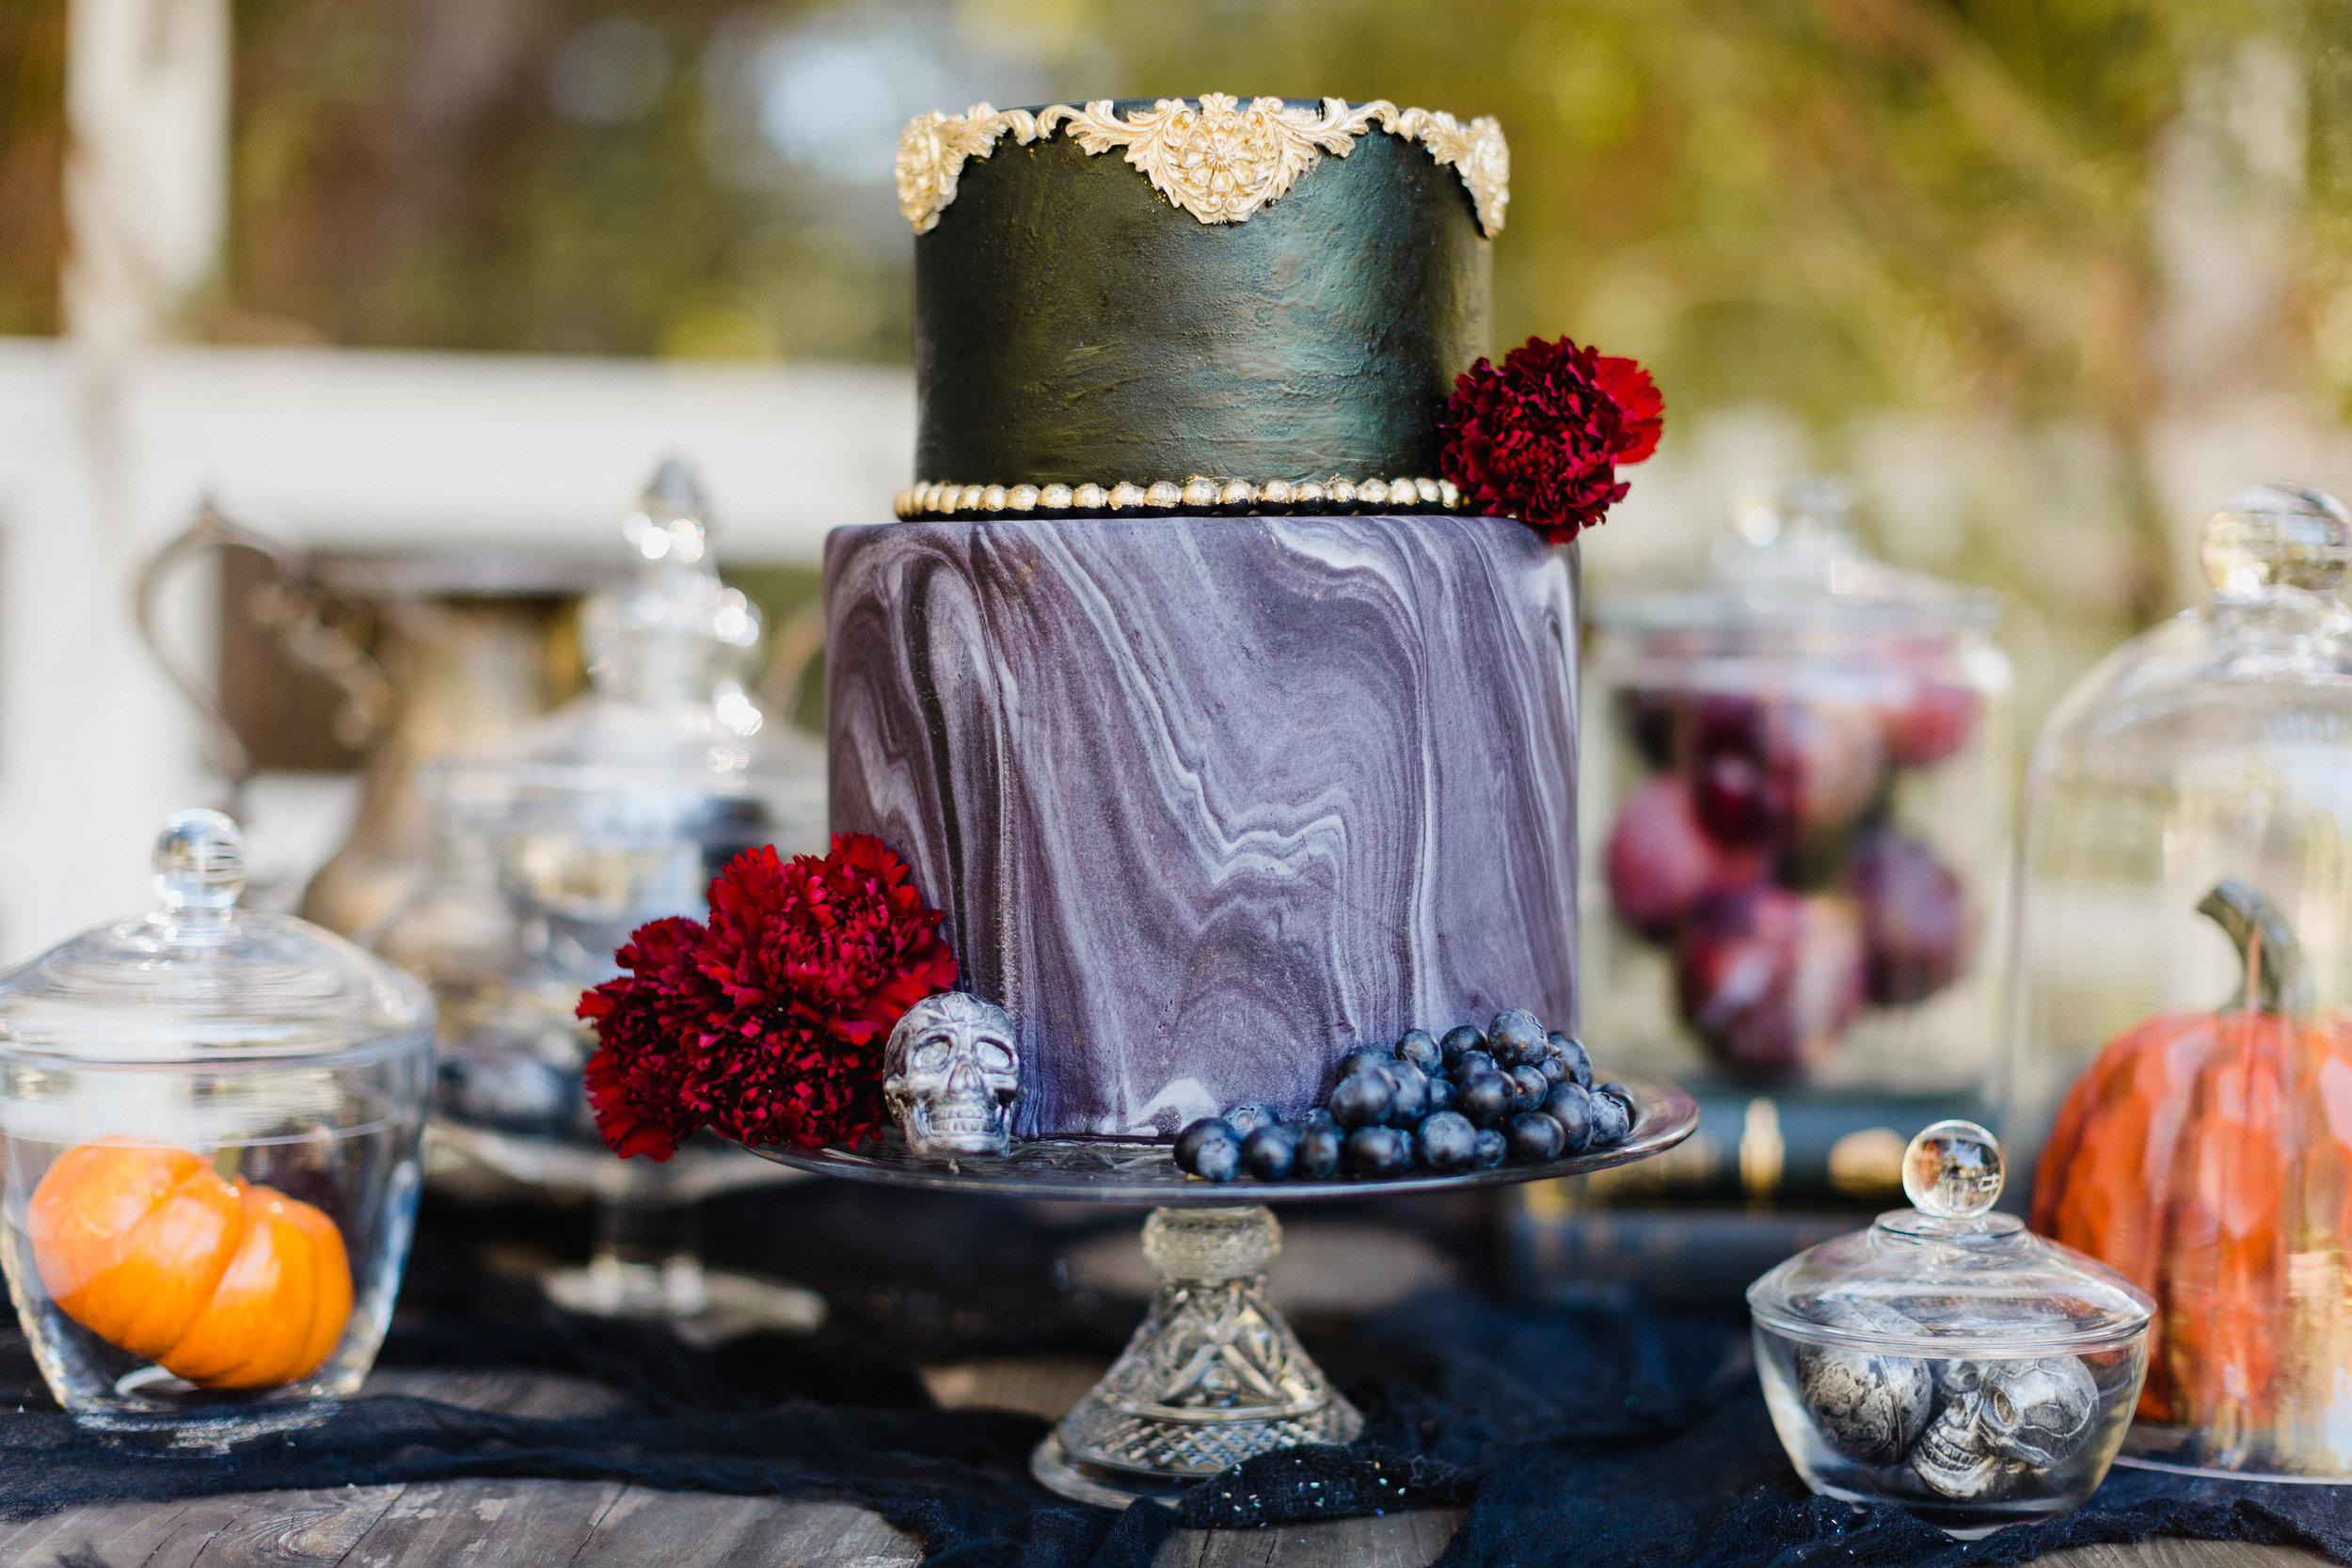 Crystal Glass Cake Stand - $10.00